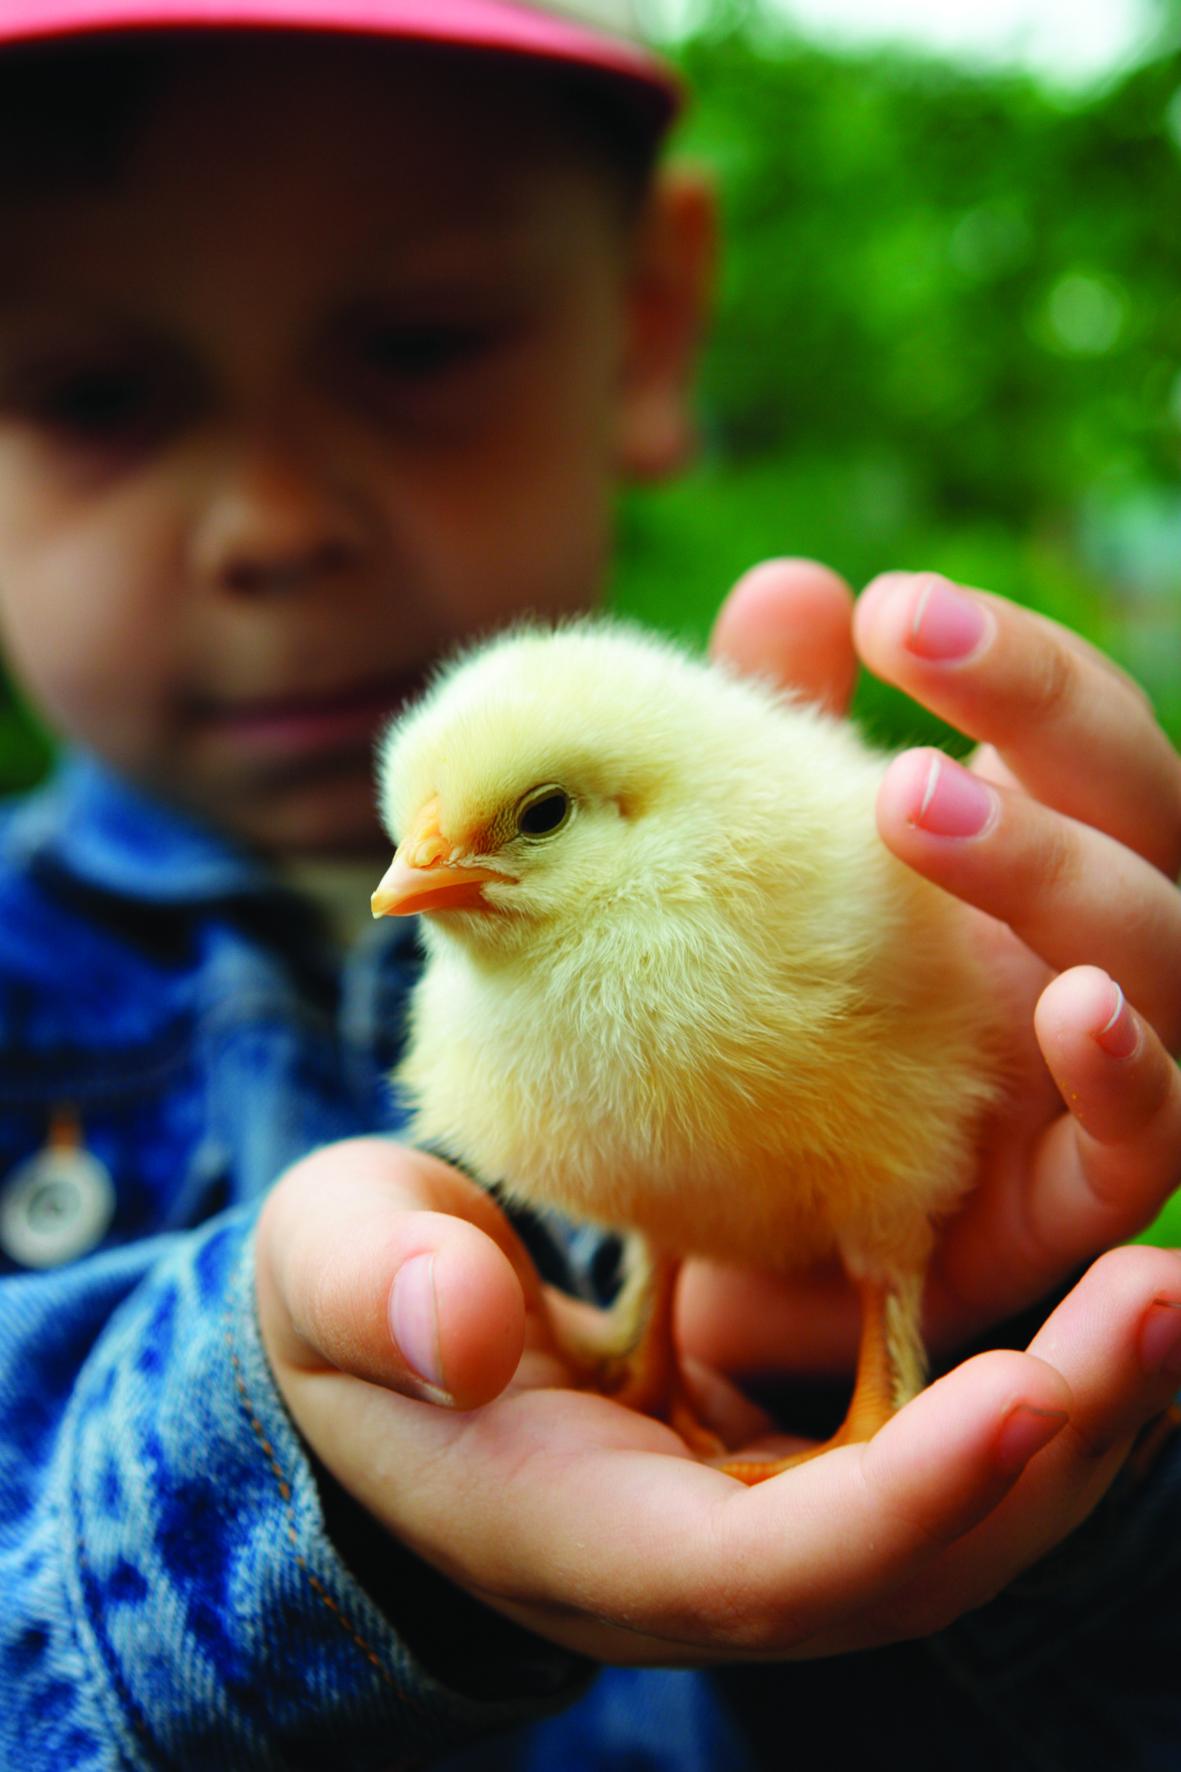 Boy with Chick at New Hatchery Birdland 1 - Enjoy a cracking time at Birdland's hatchery